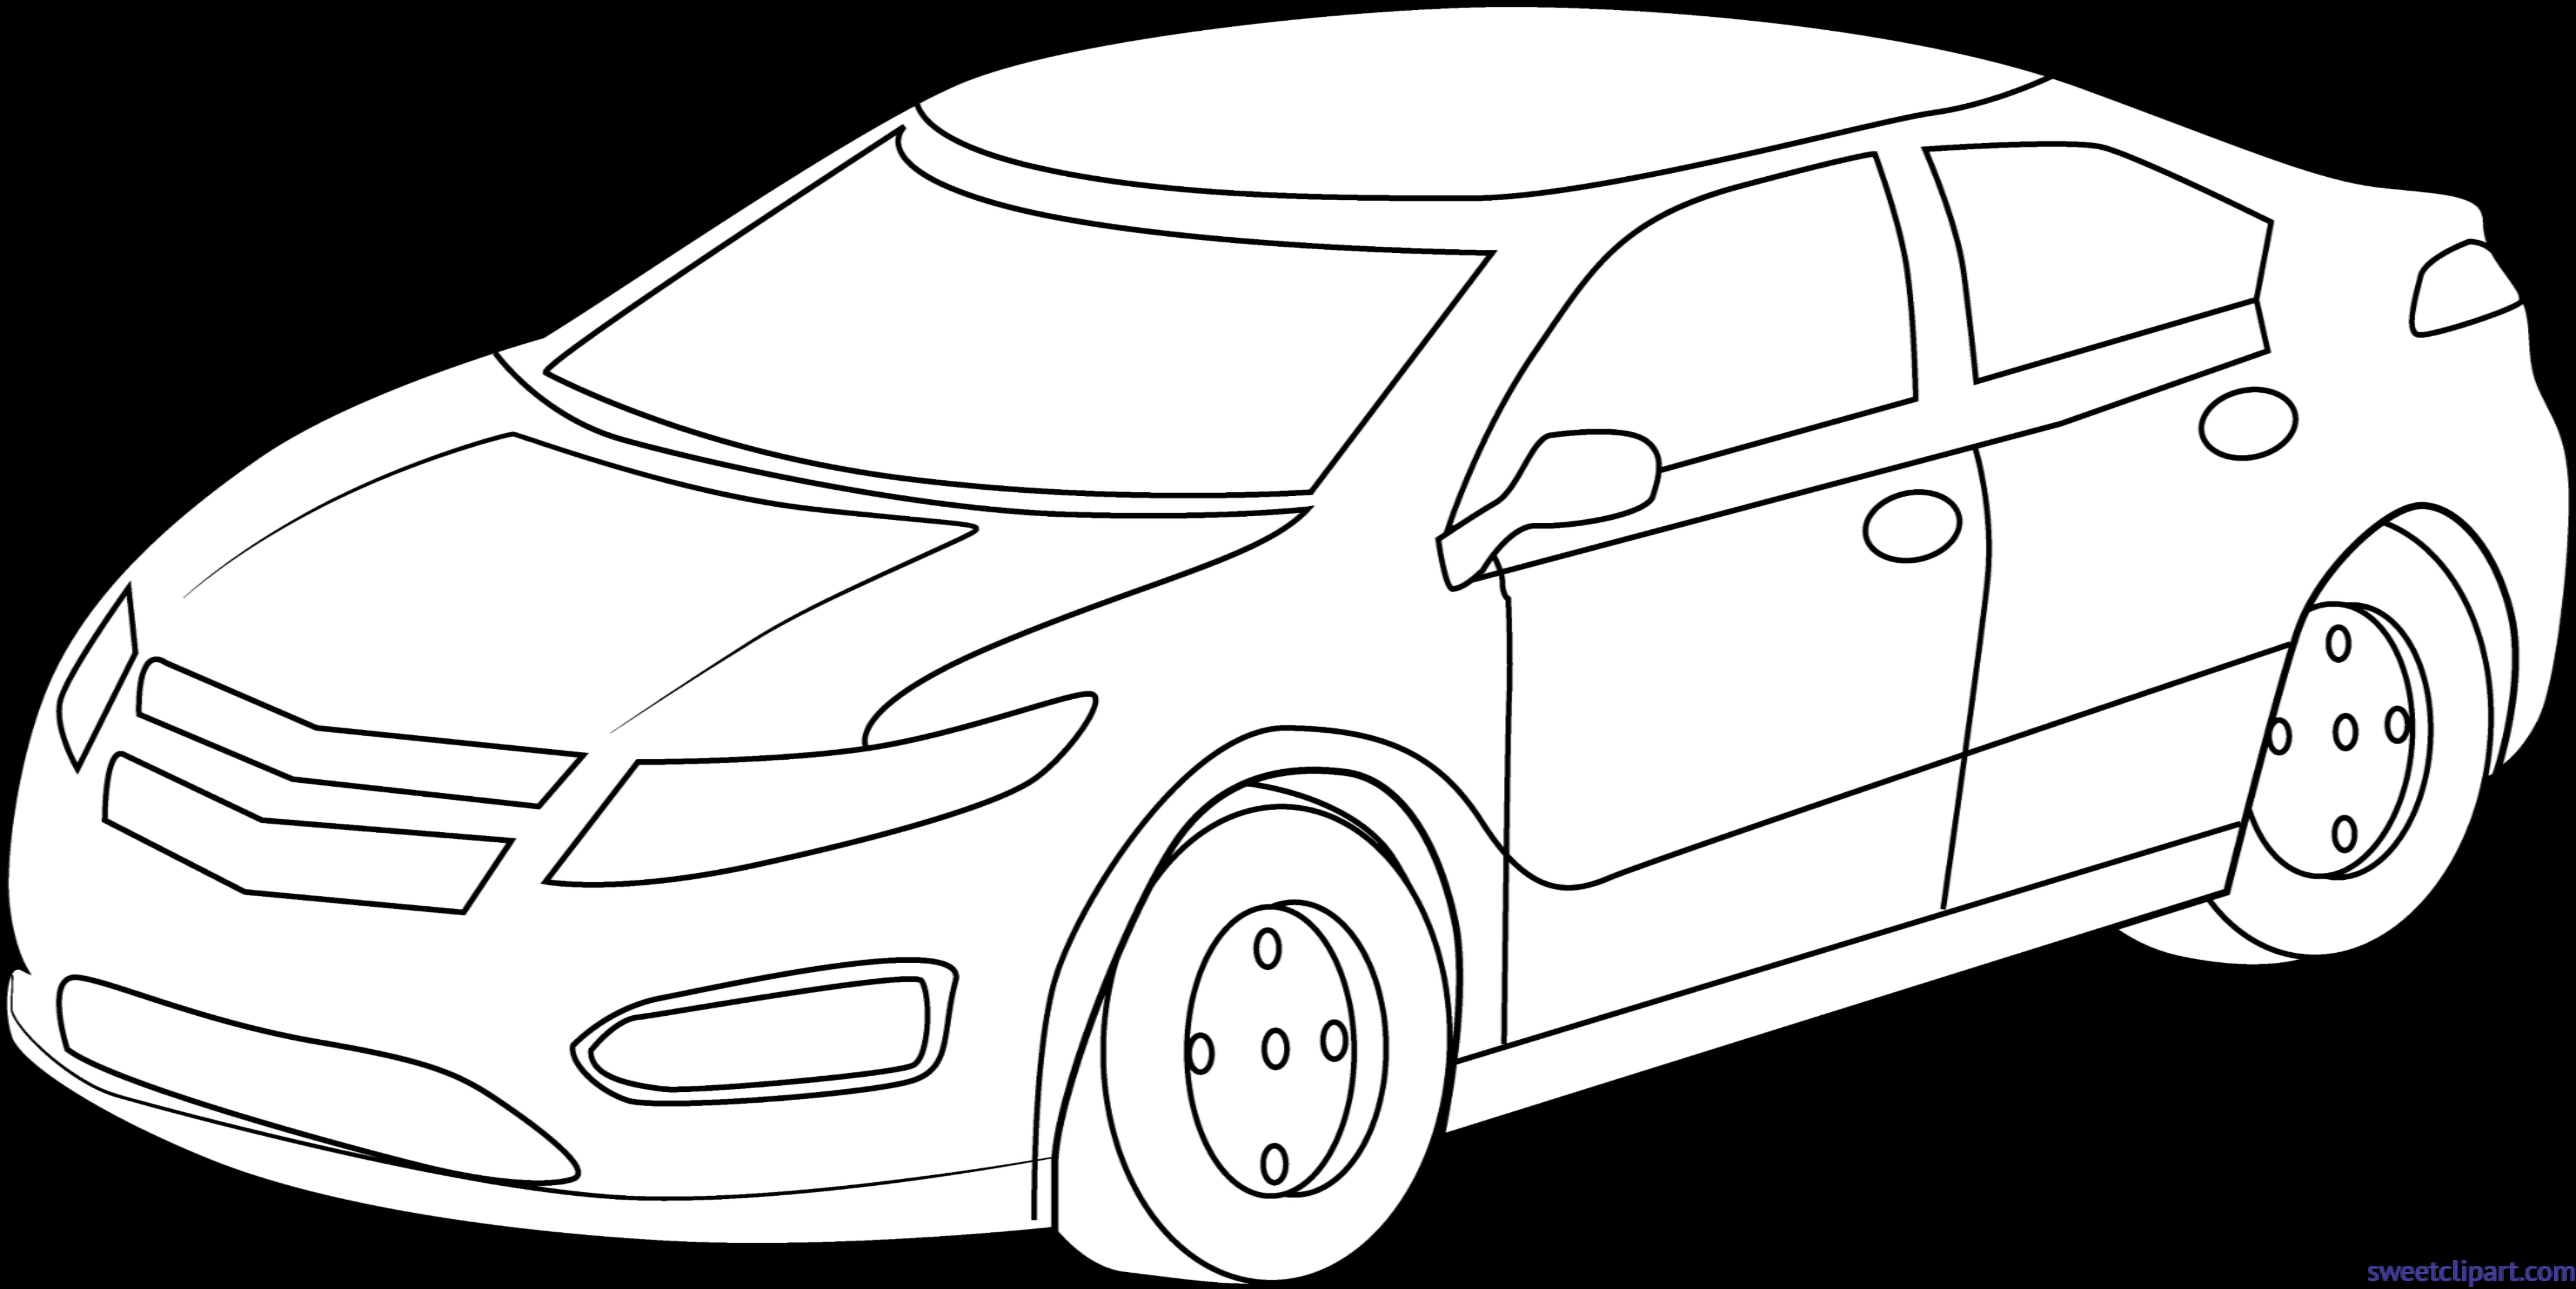 Clipart sports line art. Car lineart clip sweet